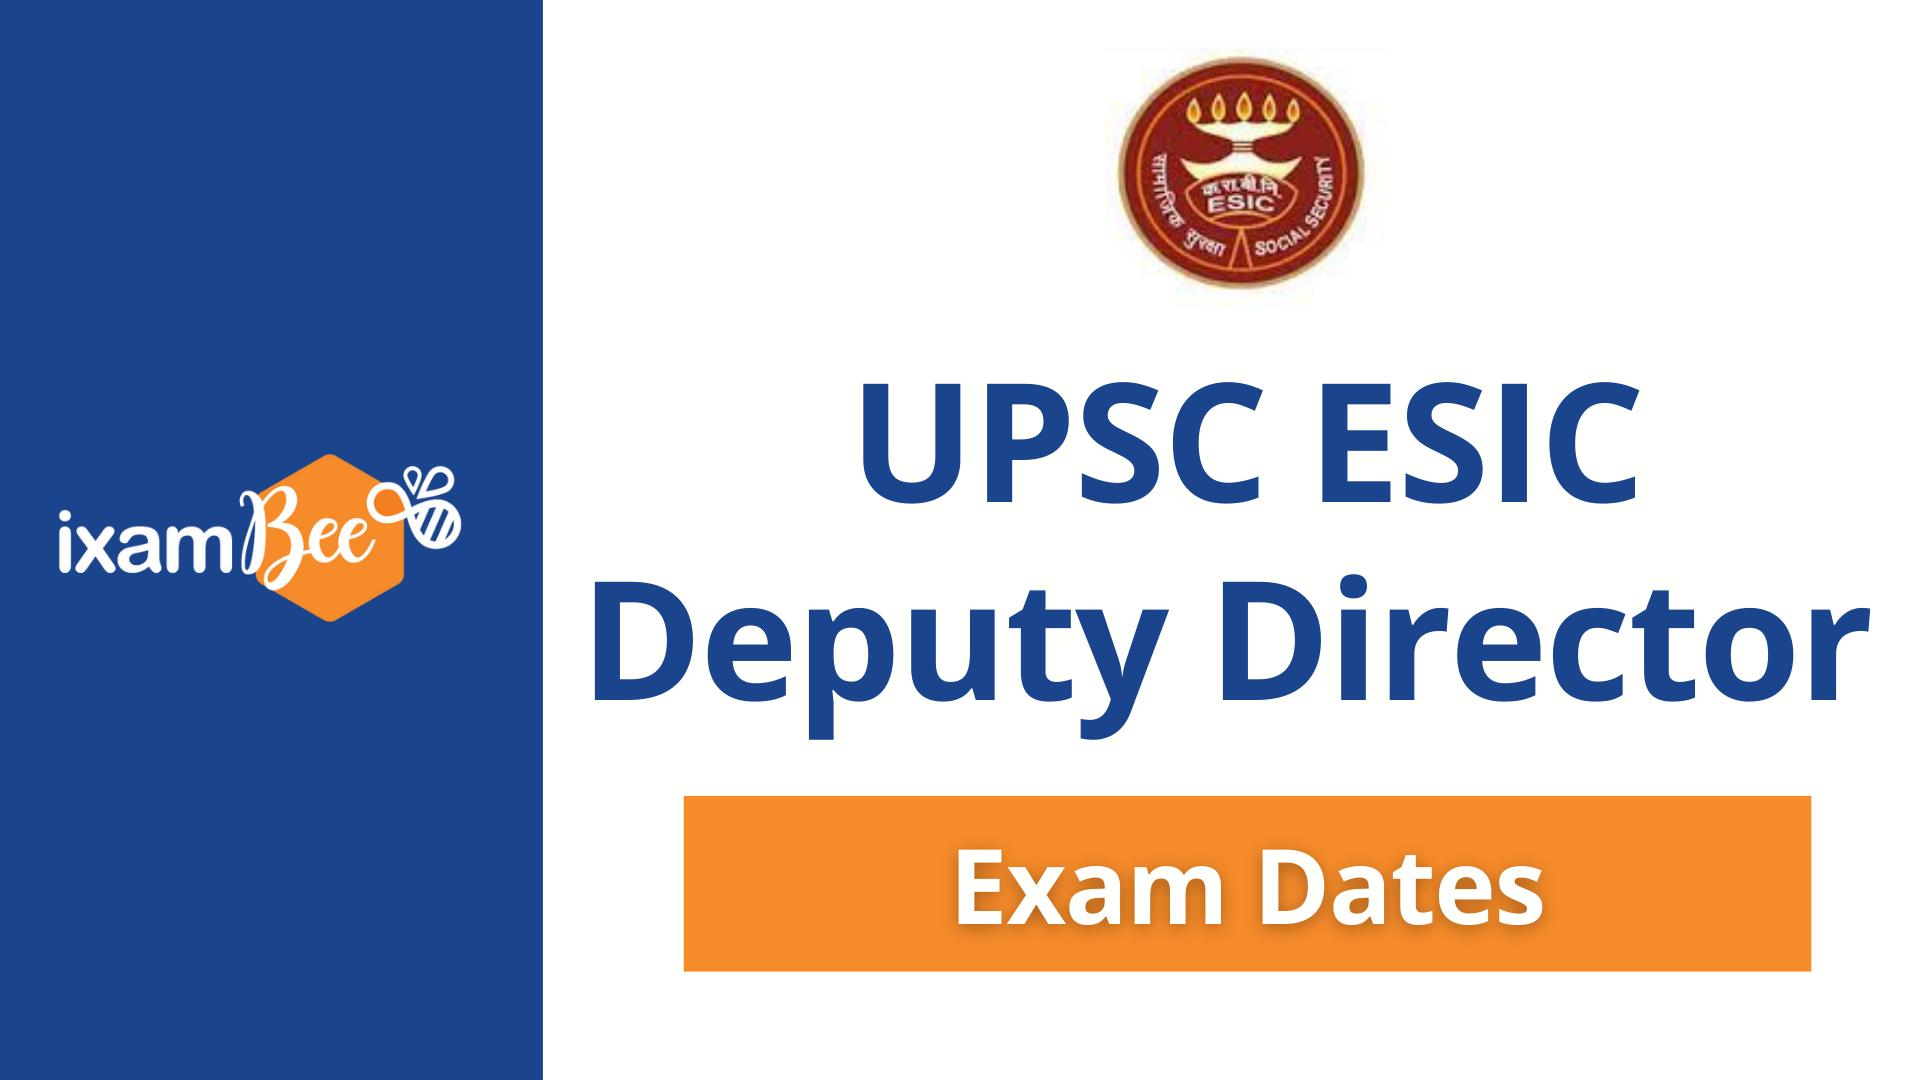 ESIC Deputy Director Exam Dates